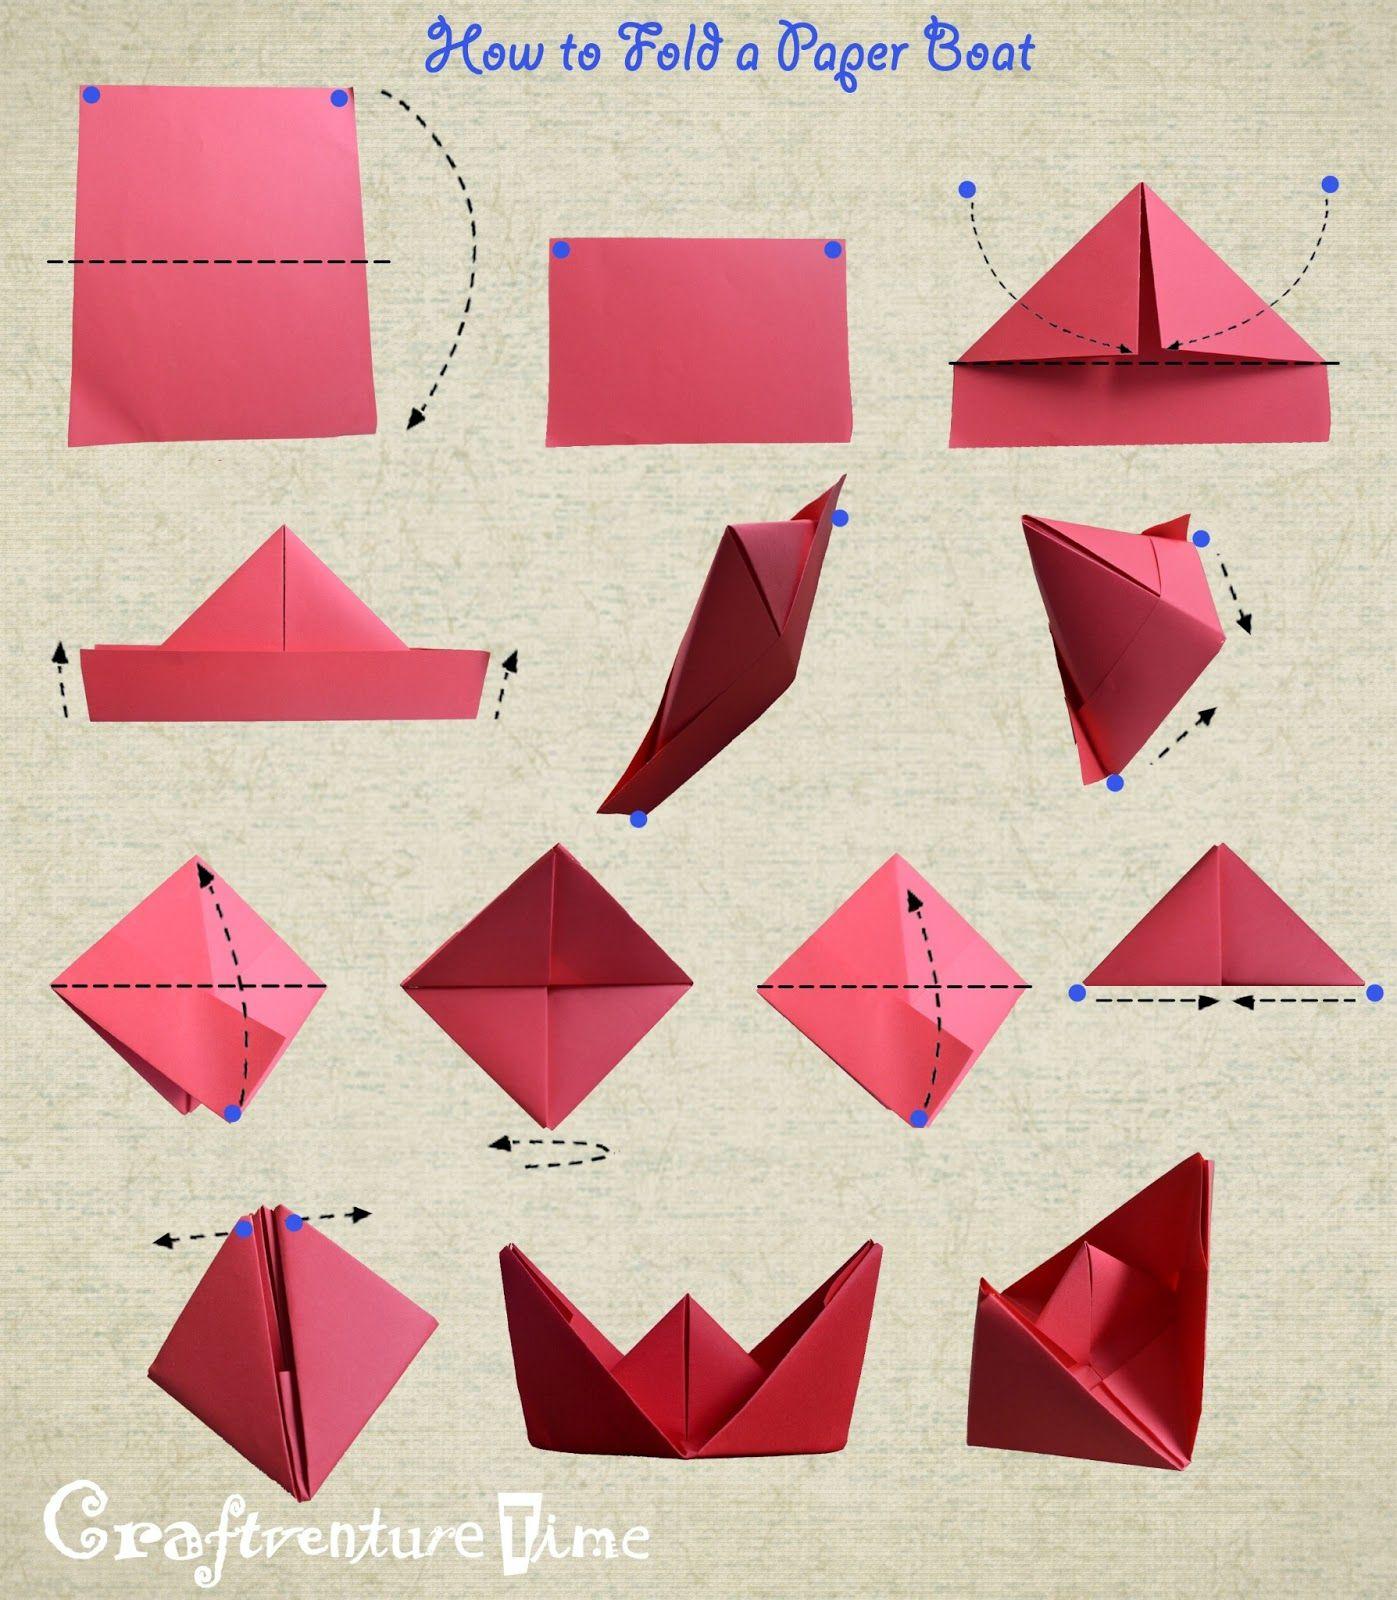 how to fold a paper boat pinterest. Black Bedroom Furniture Sets. Home Design Ideas